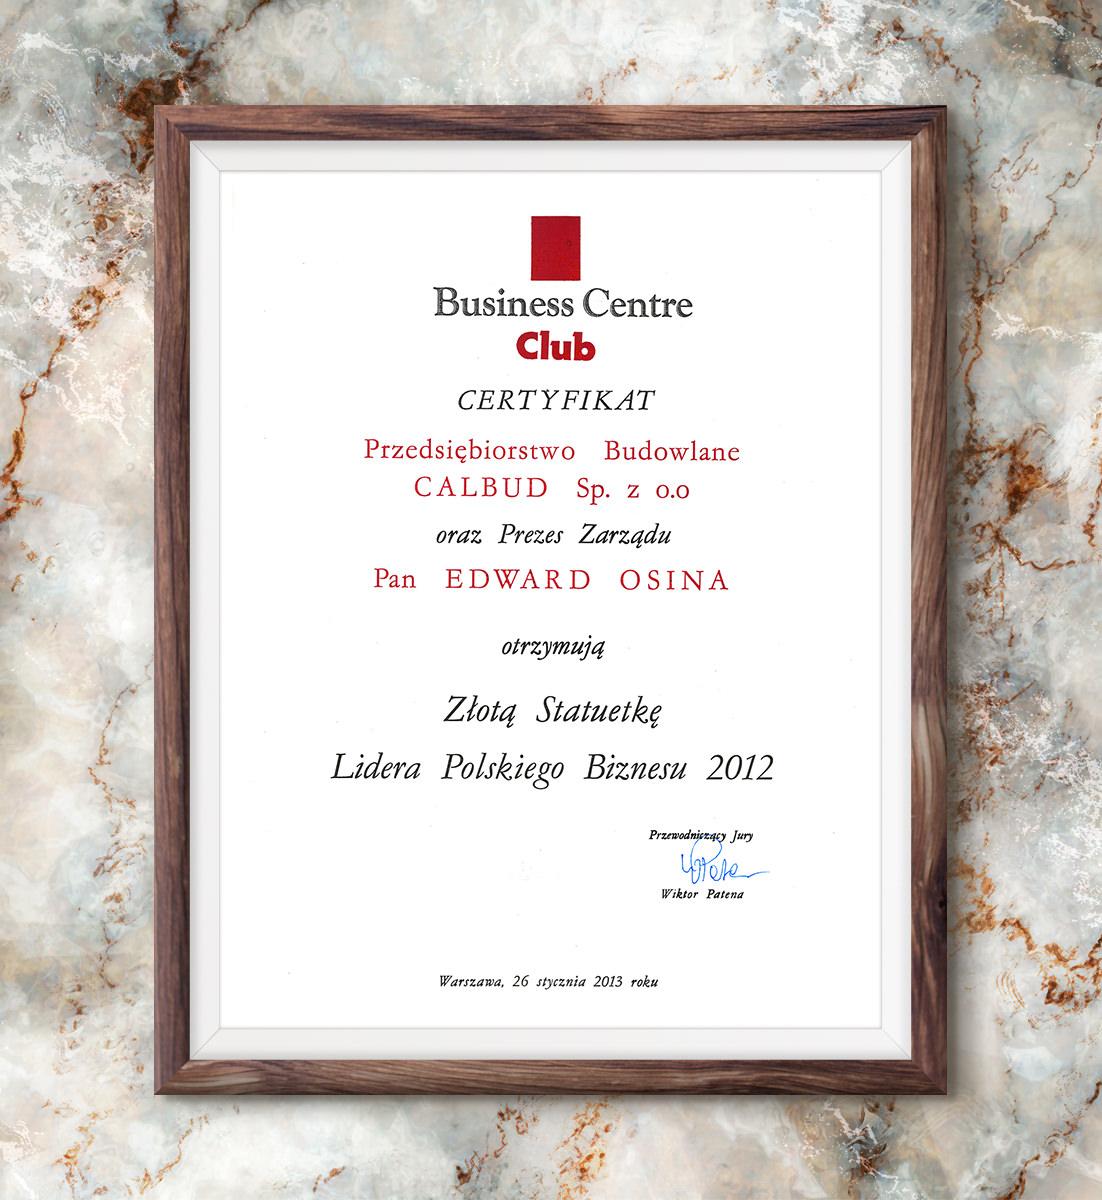 Złota Statuetka Lidera Polskiego Biznesu 2012